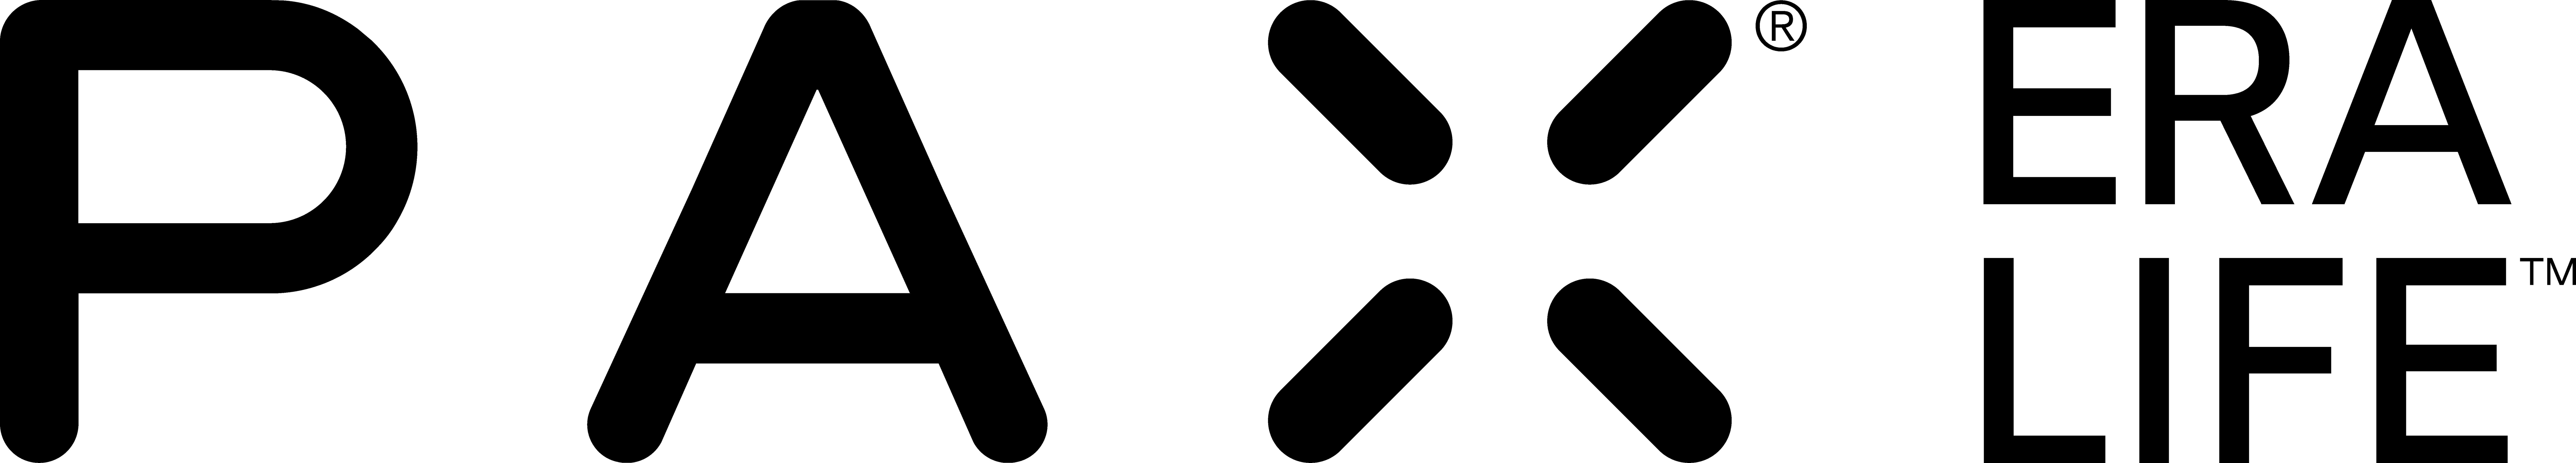 Logo of PAX